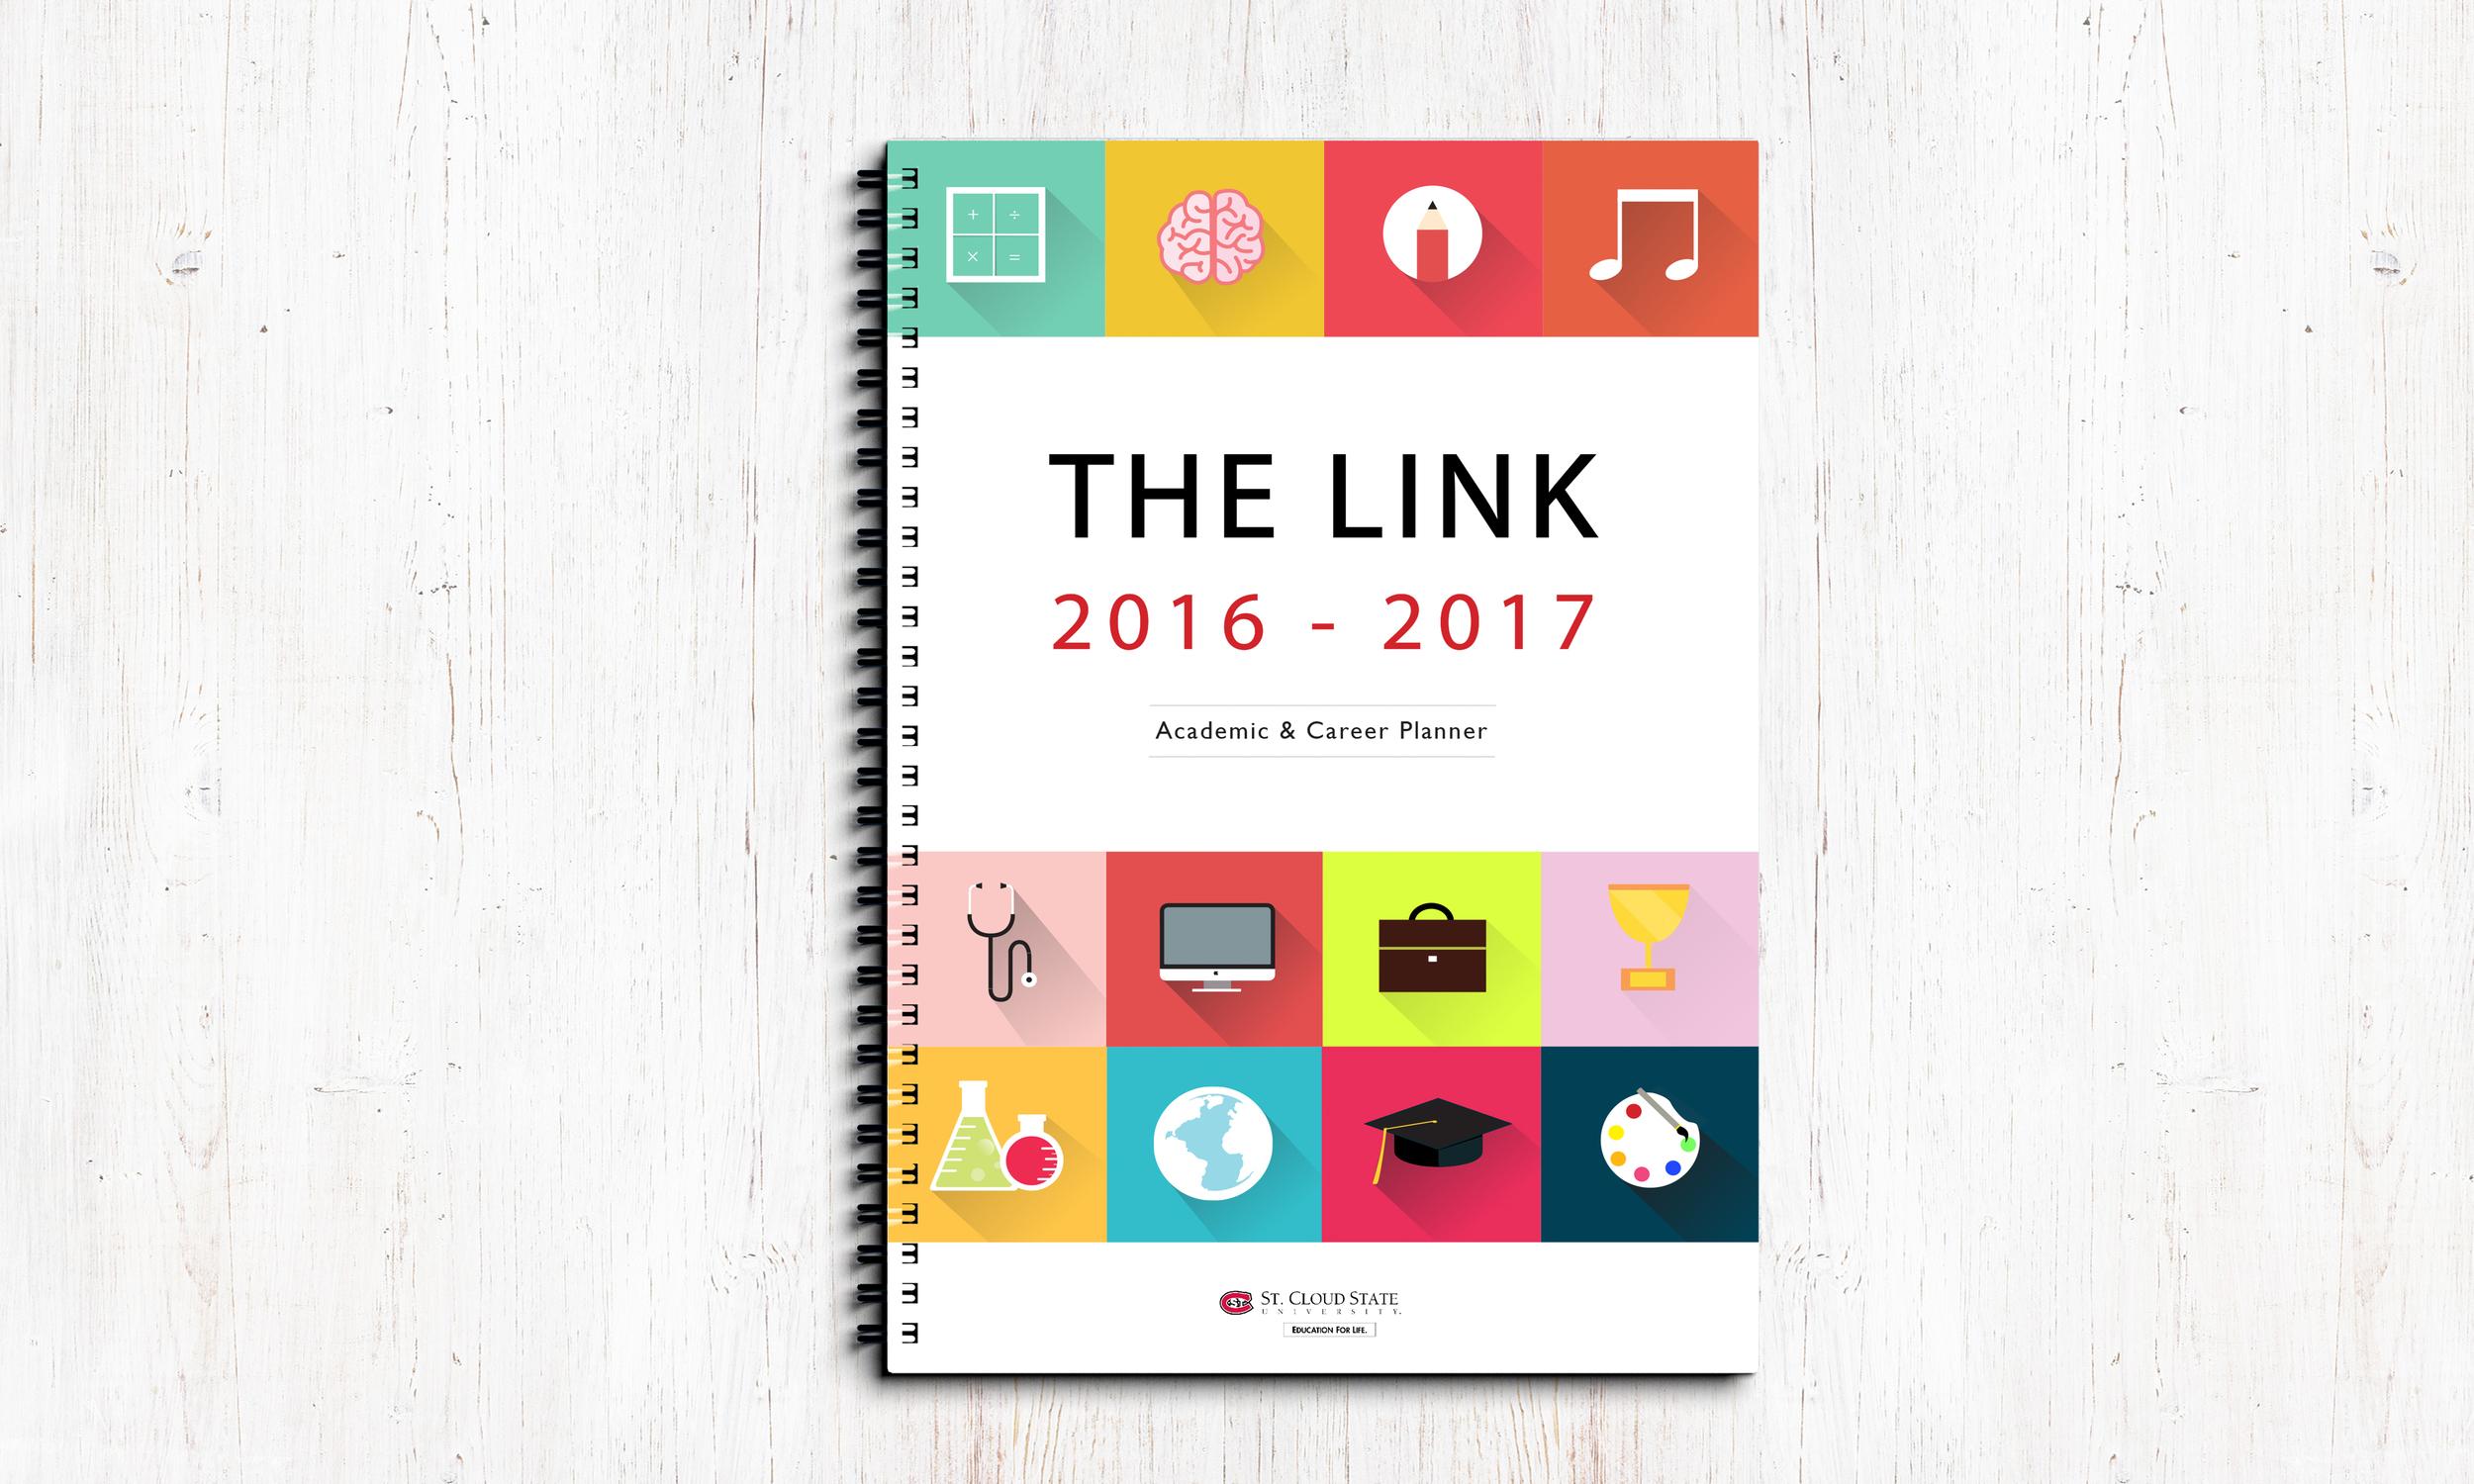 the link y pham